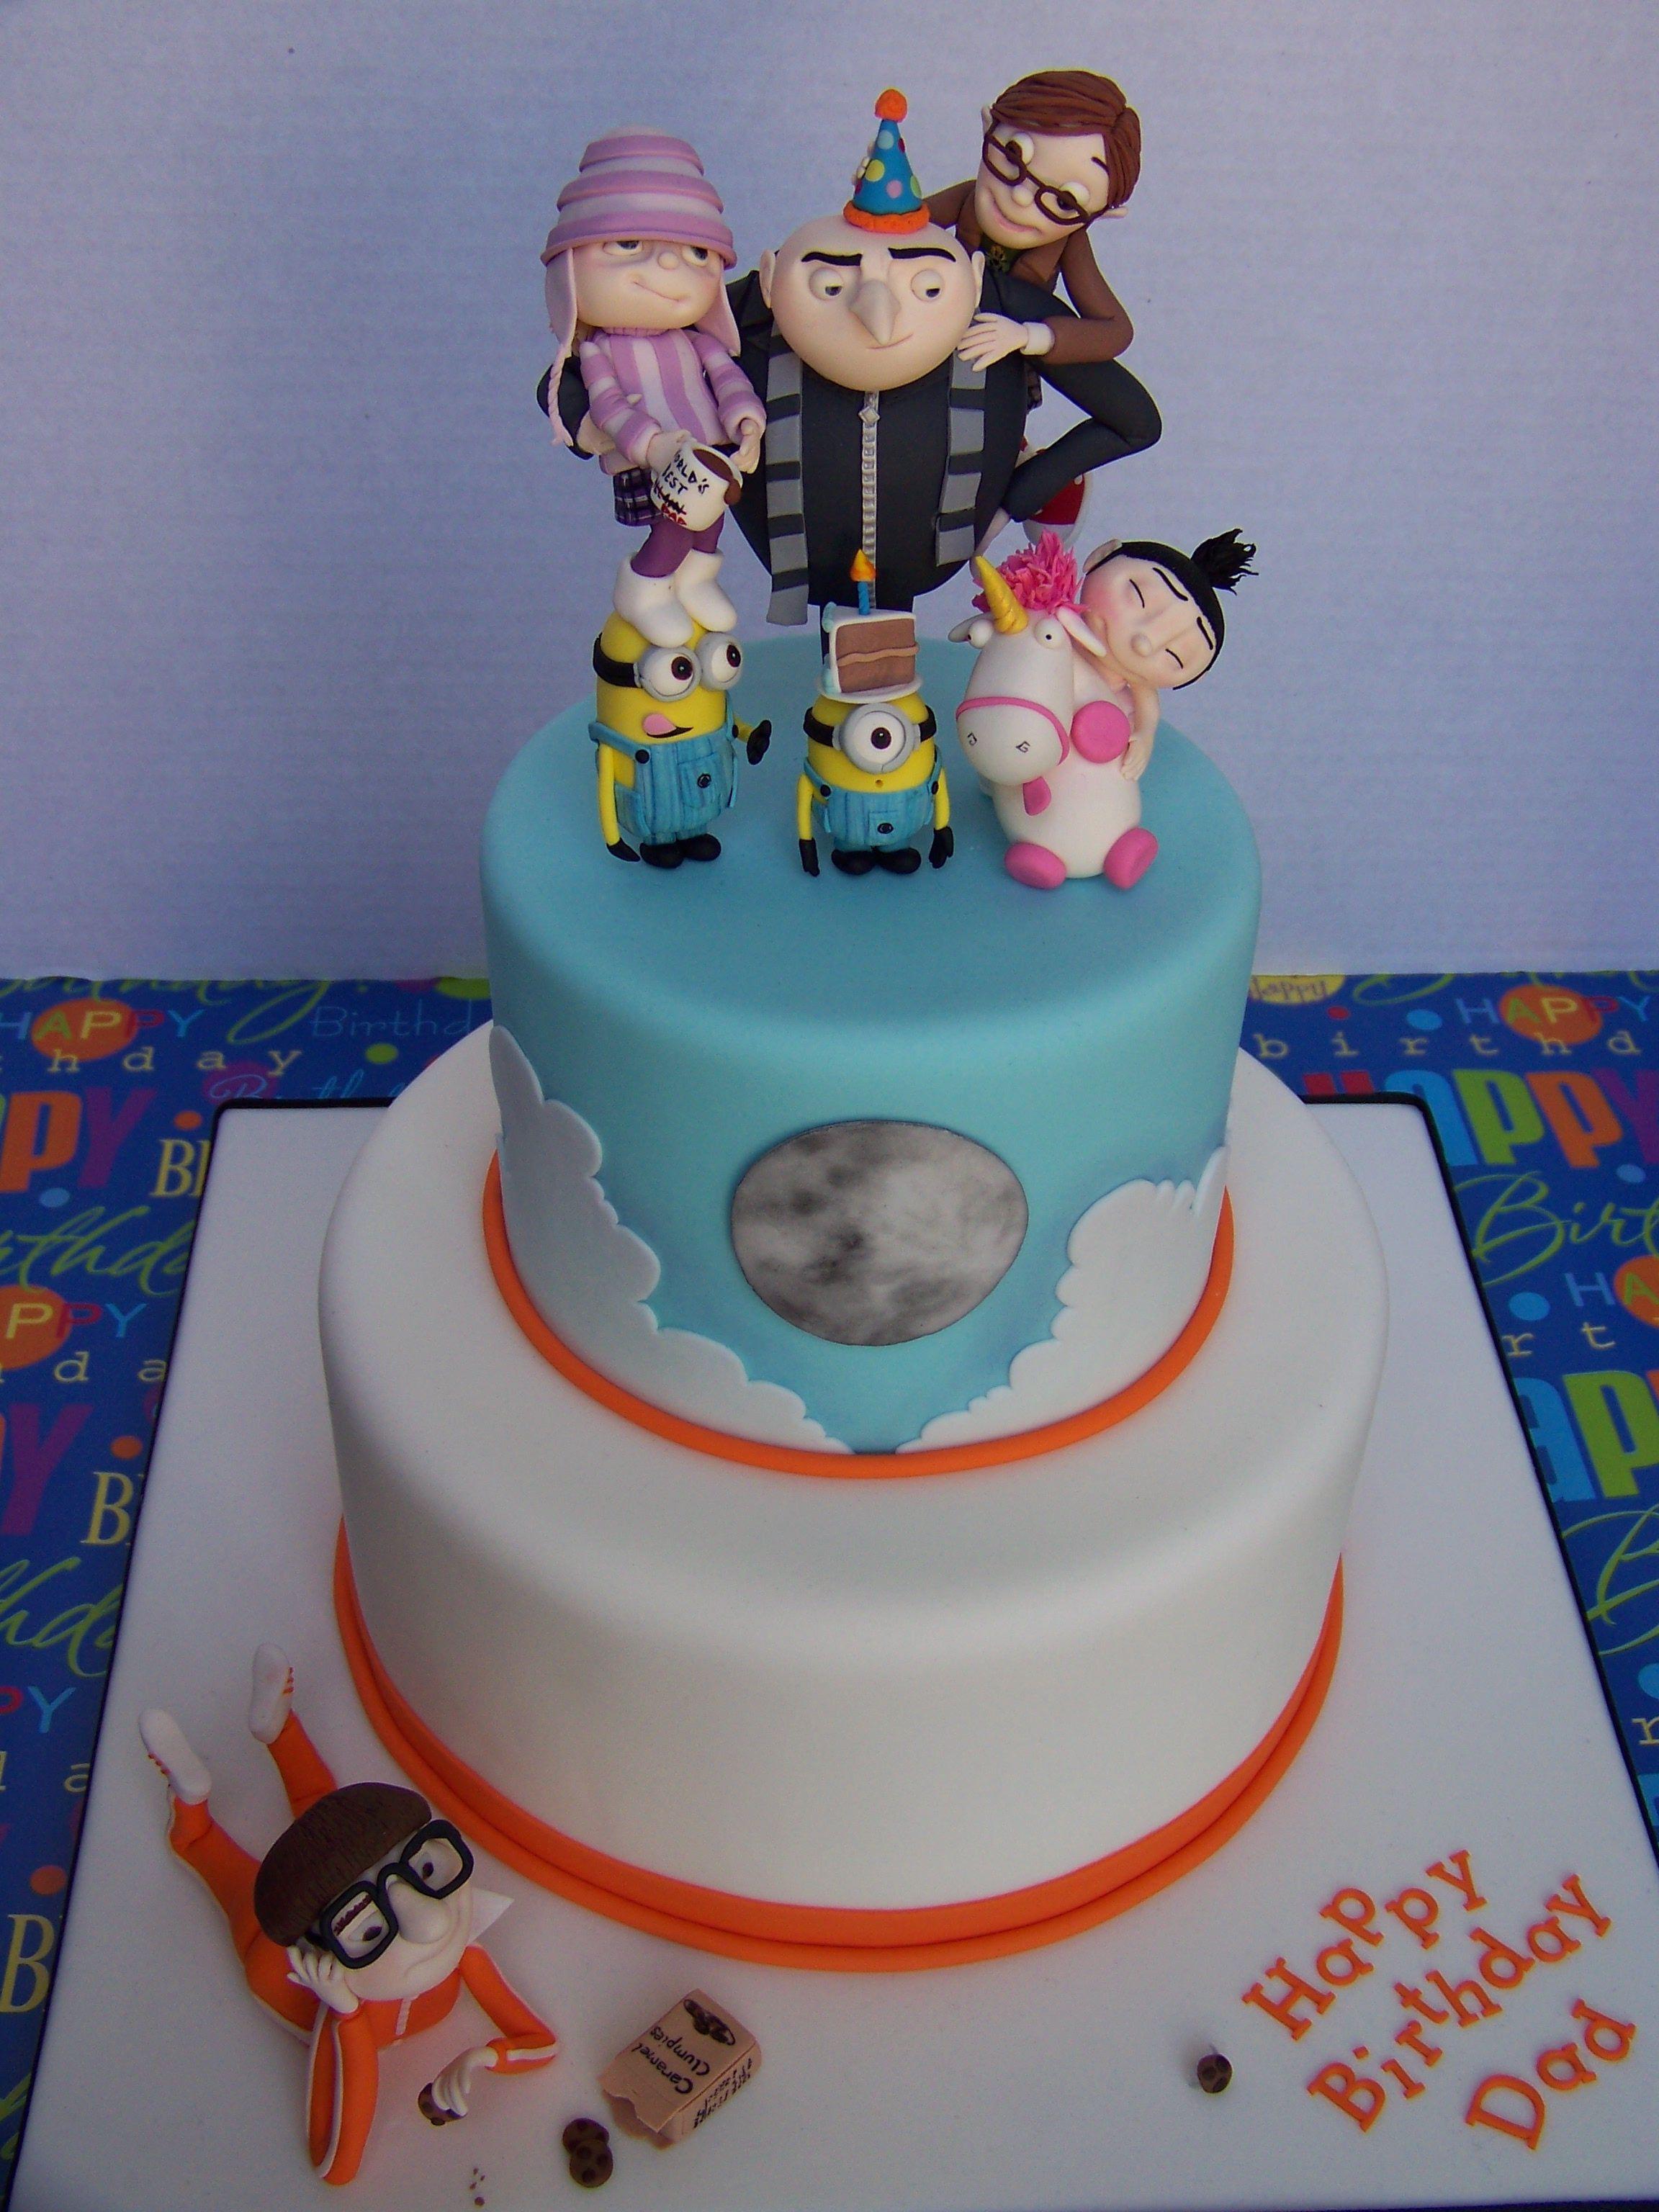 Marvelous 004Jpg Minion Cake Despicable Me Cake Birthday Cards Printable Riciscafe Filternl